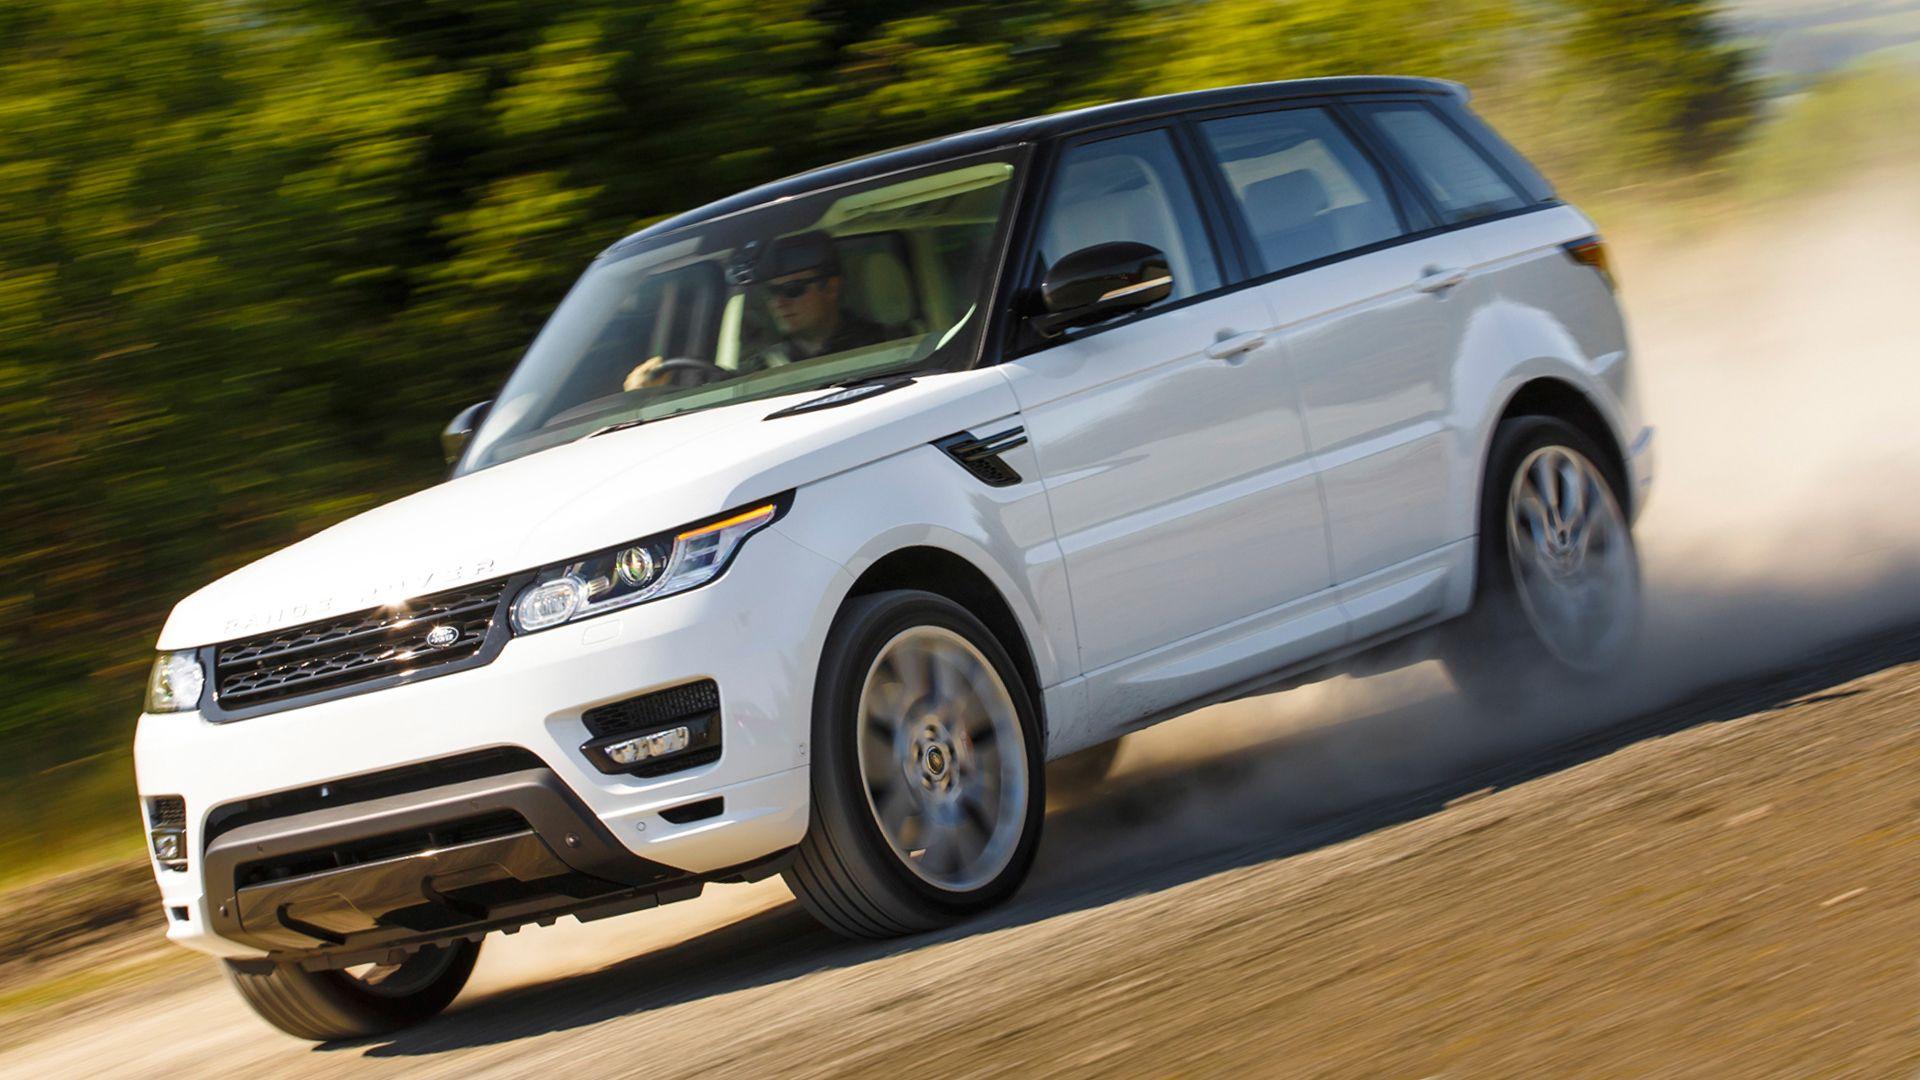 2019 Range Rover Sport Price Range rover, Range rover